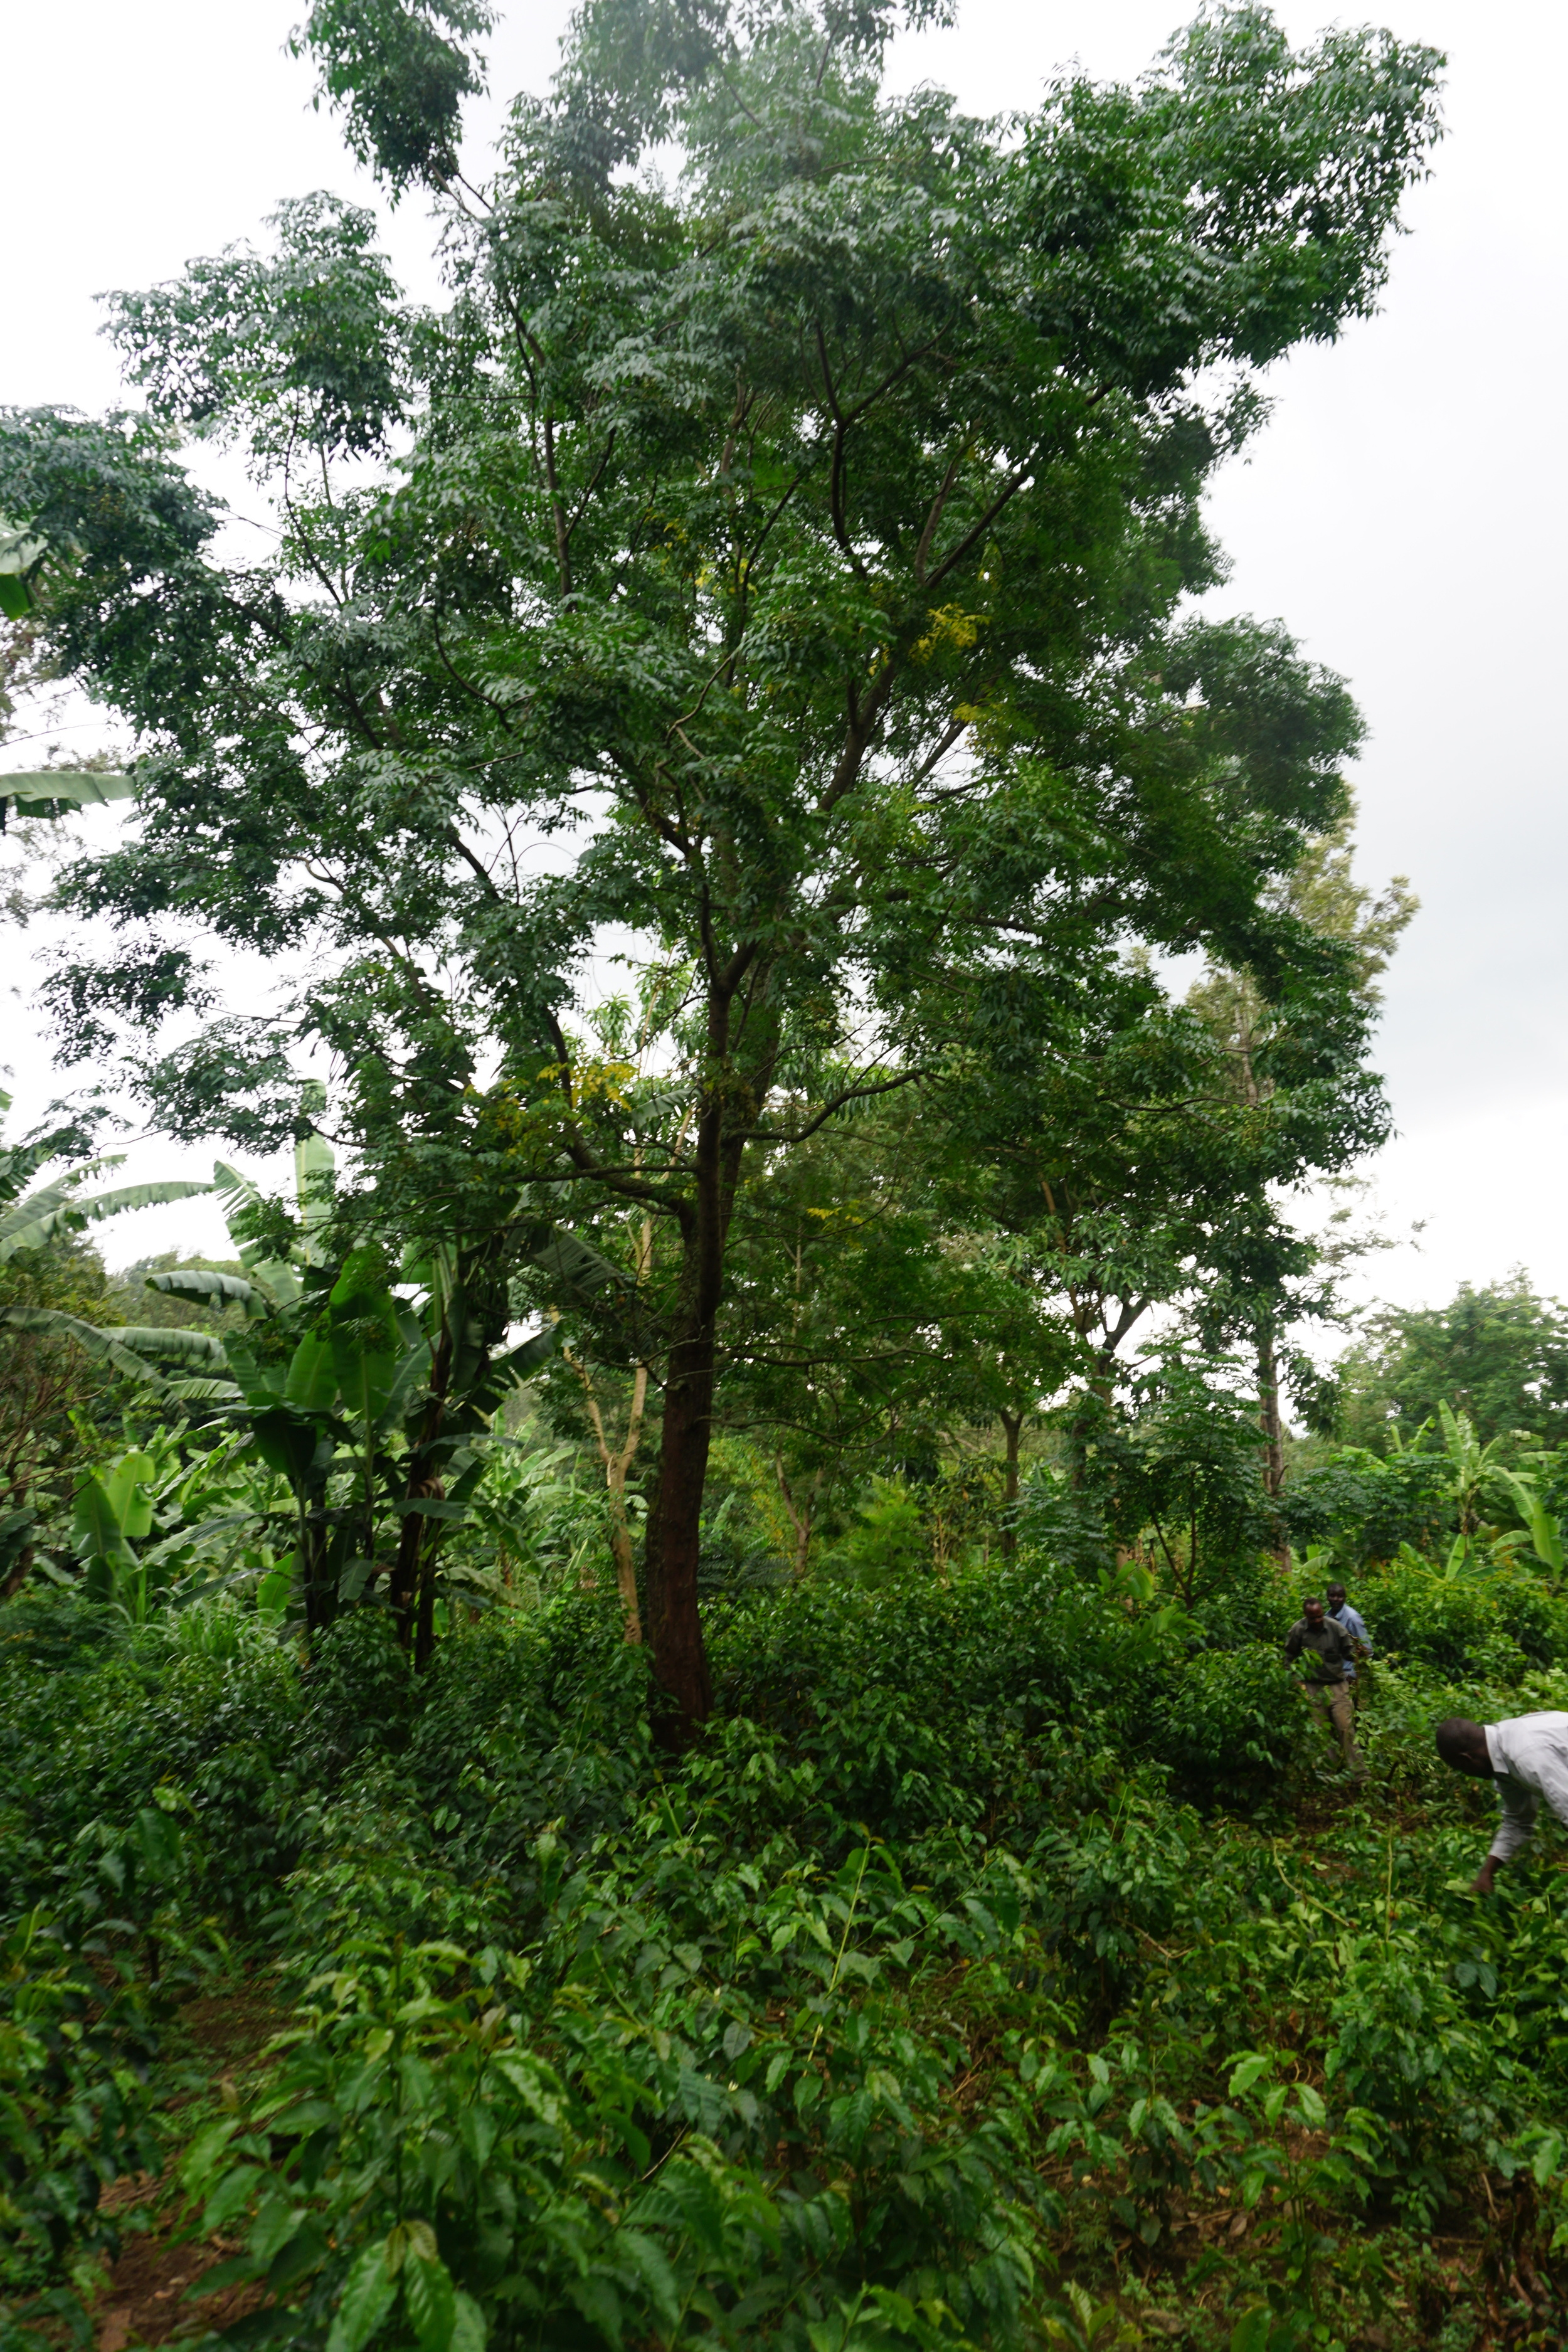 A moringa tree in the middle of the nursing shrub area.